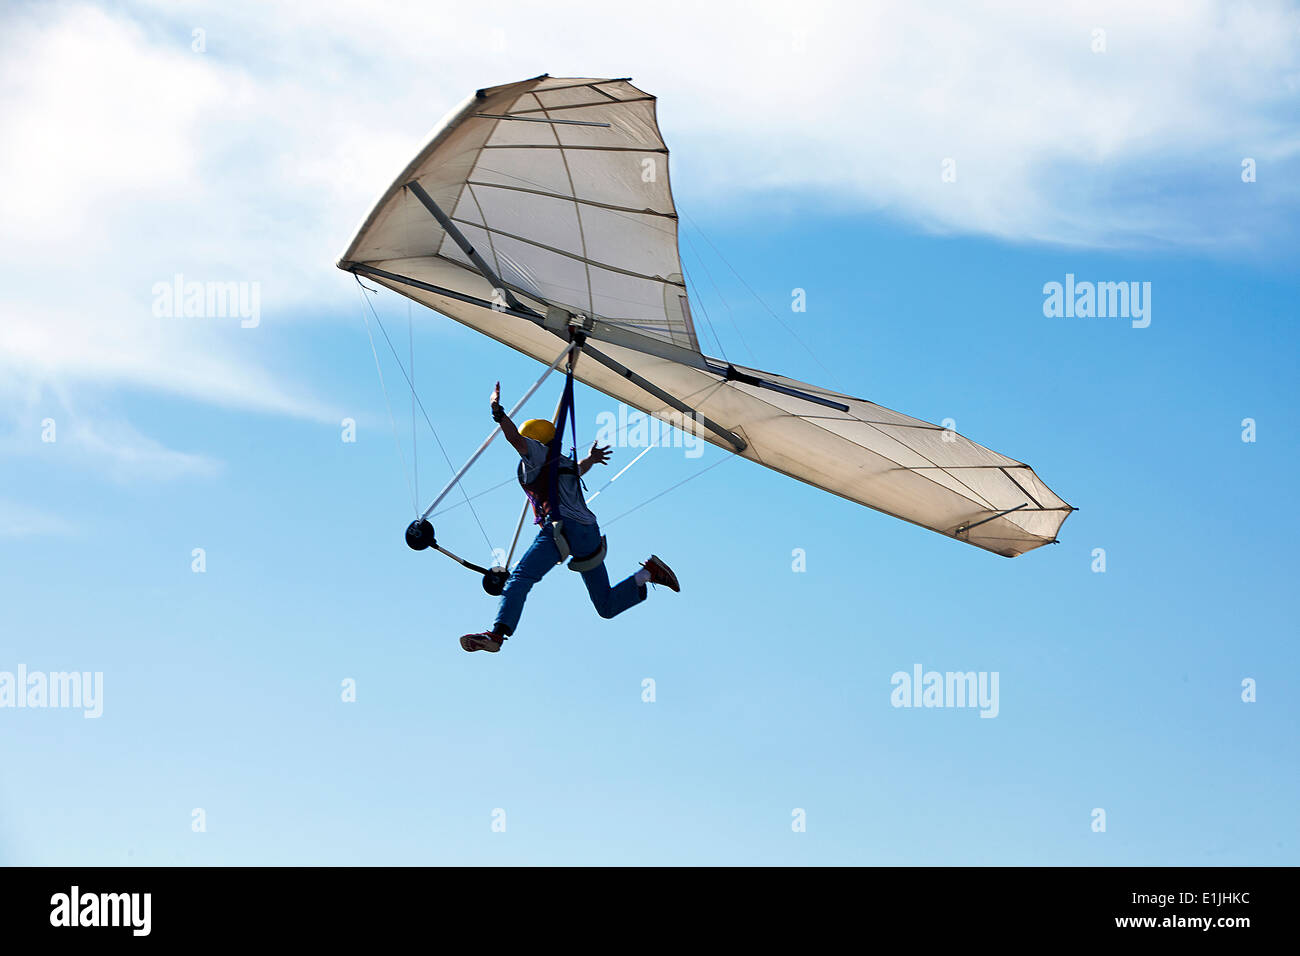 Homme deltaplane vol Photo Stock